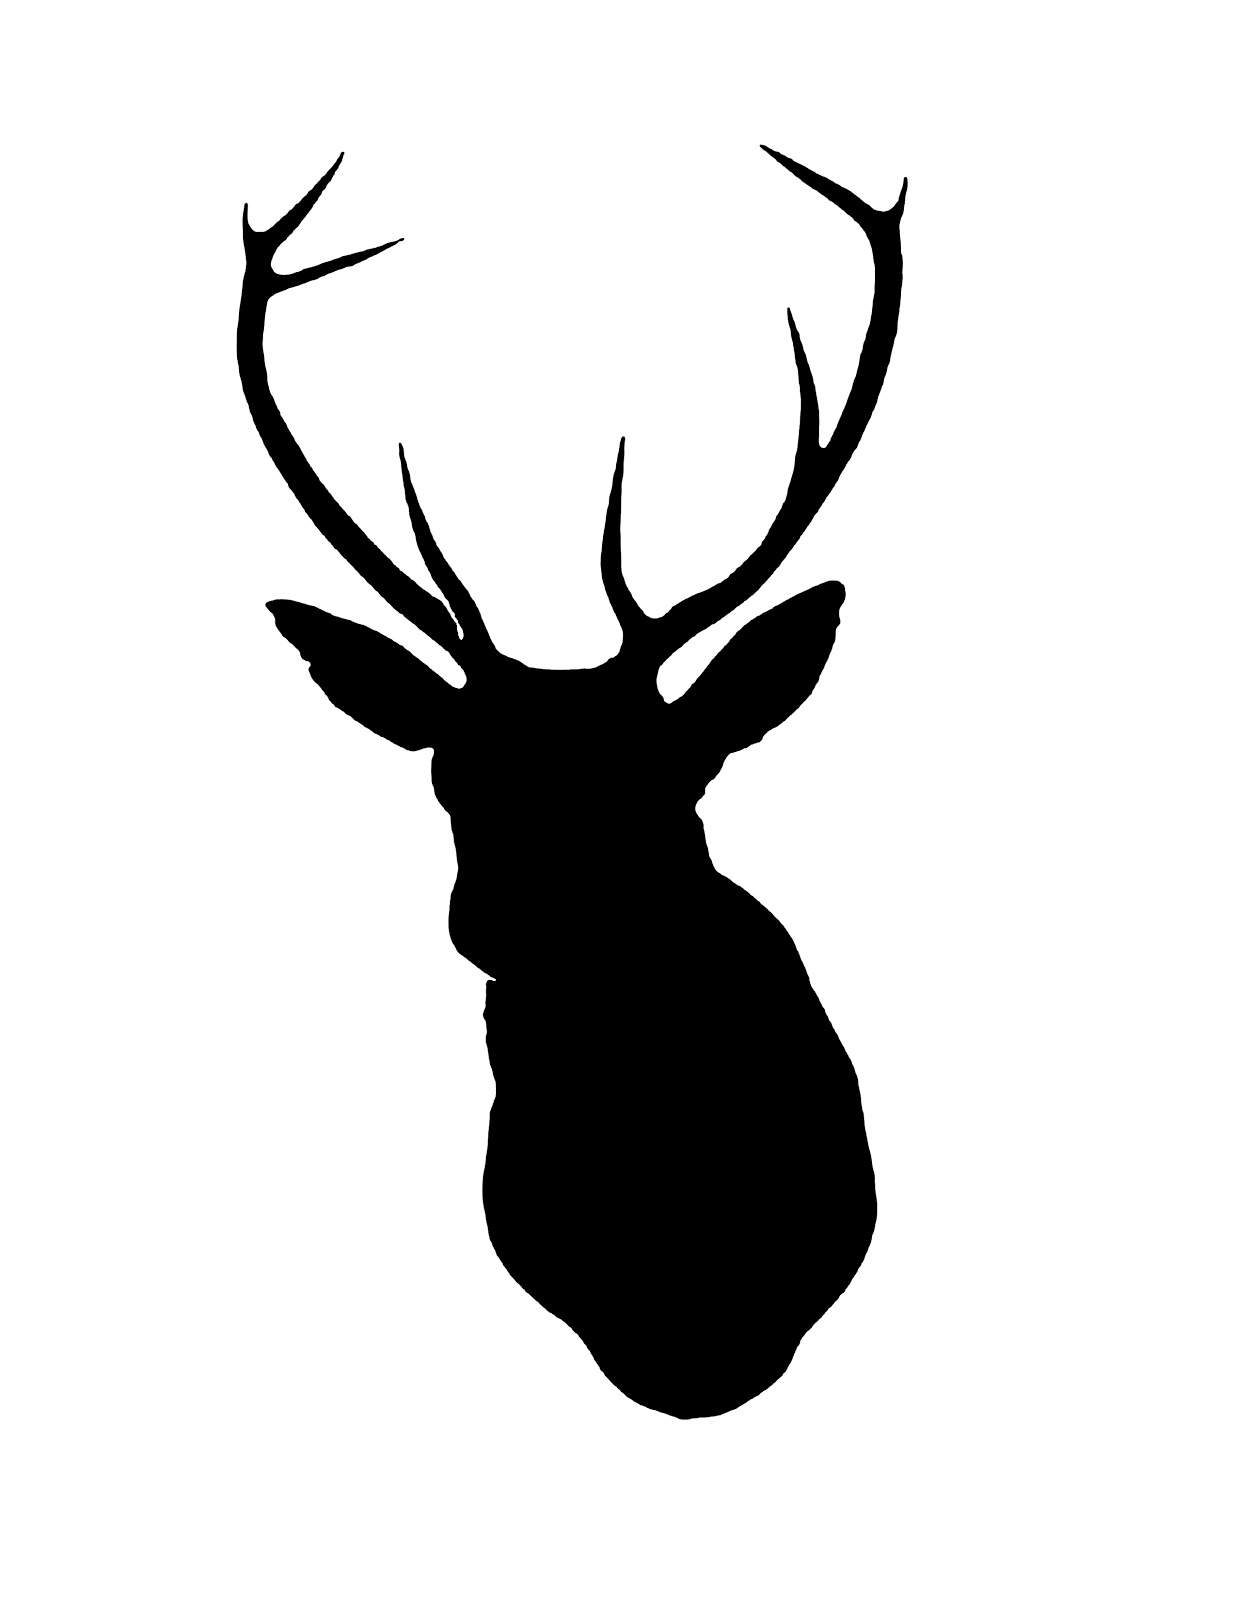 1236x1600 Deer Head Silhouette Clip Art